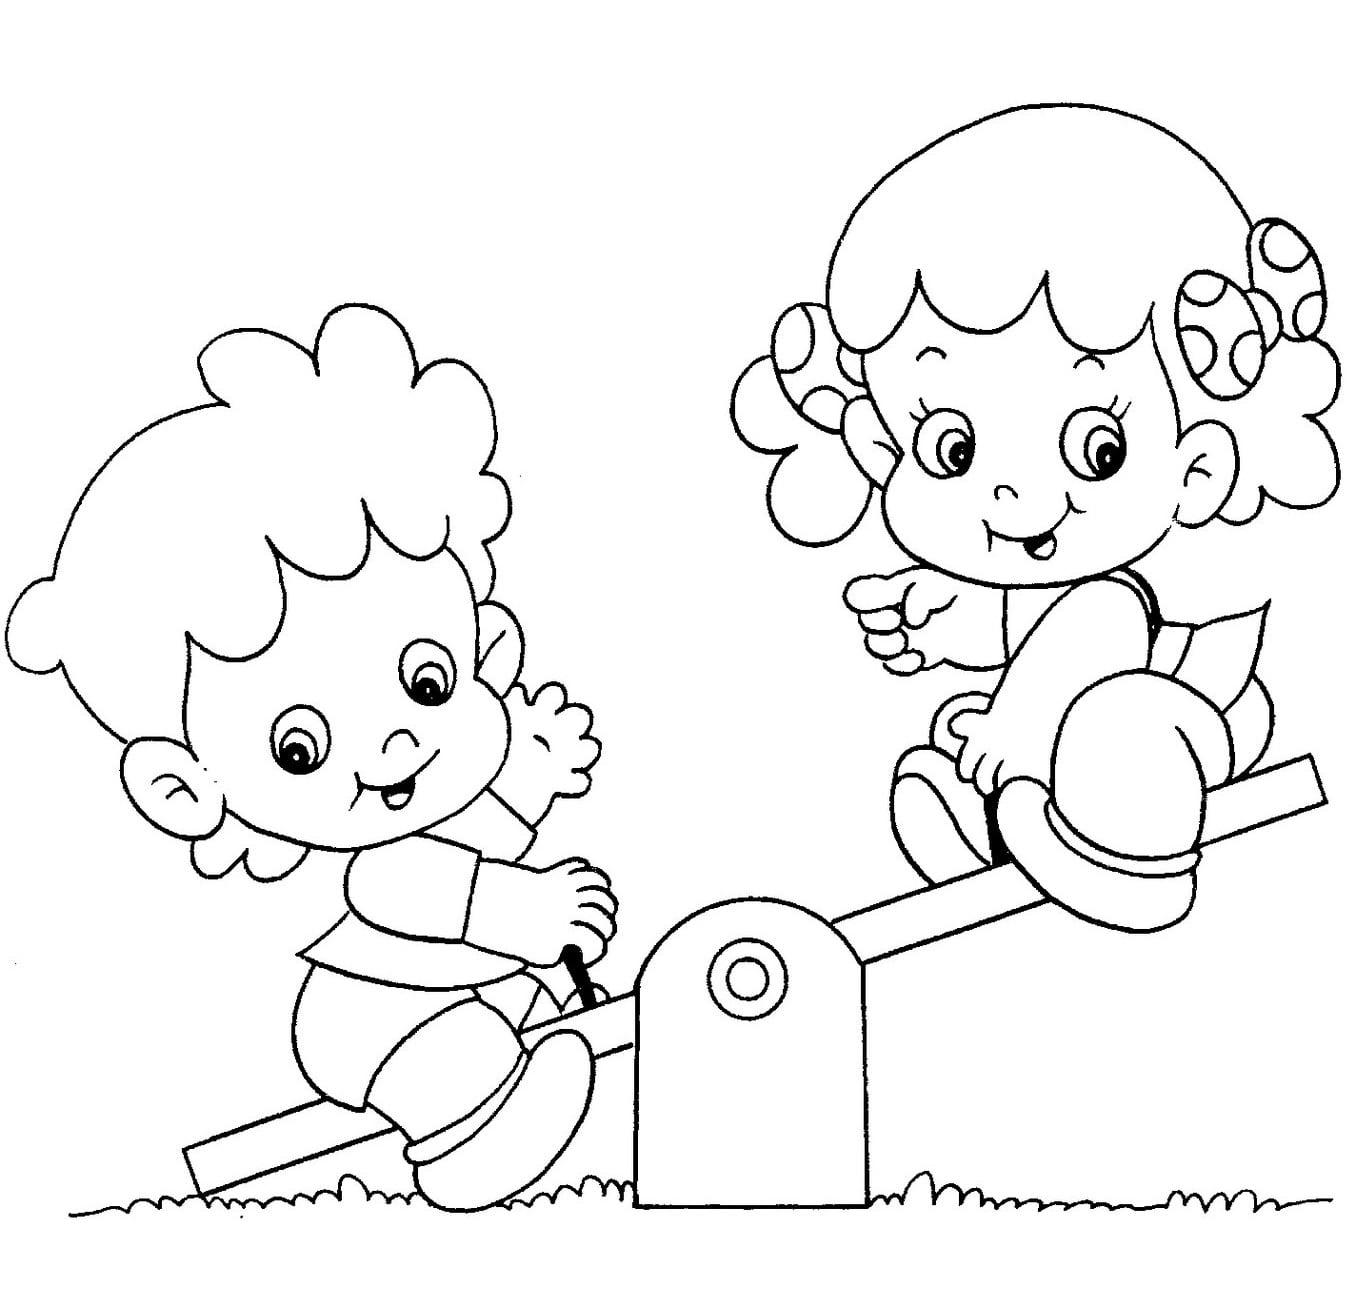 Desenhos Para Colorir De Meninos – Pampekids Net